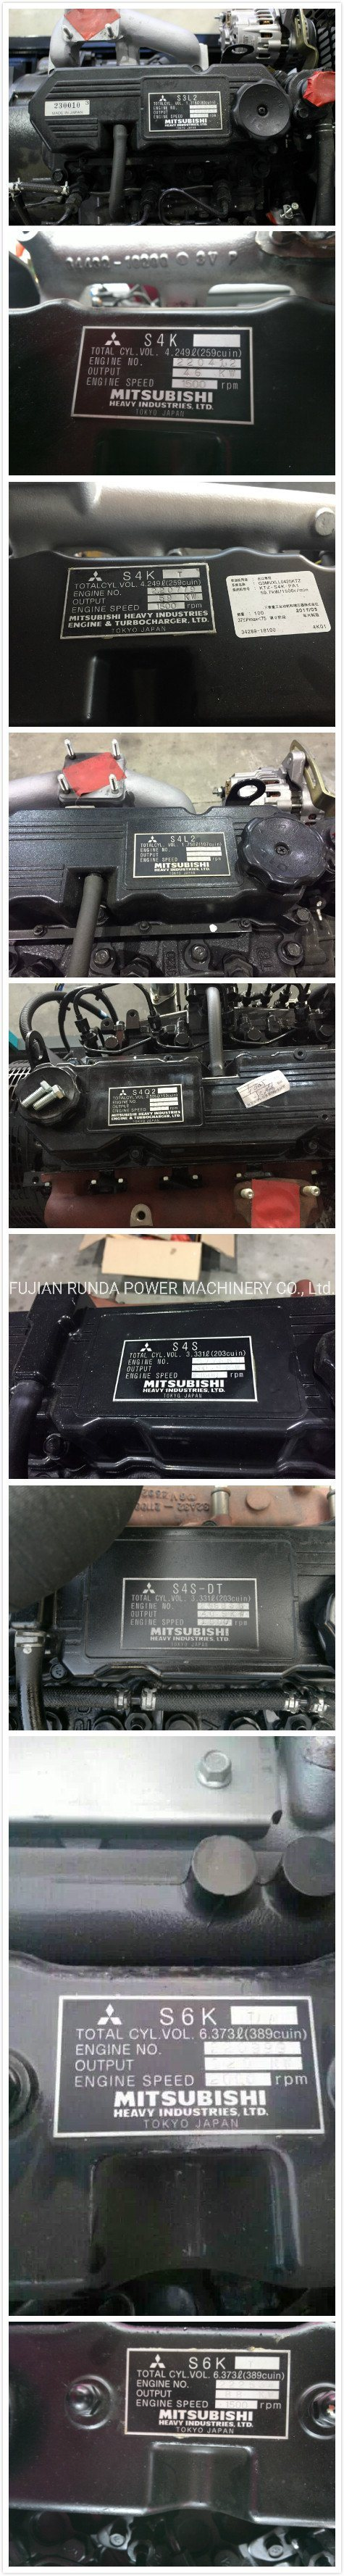 50Hz Mitsubishi Diesel Engine Original From Japan with Mecc Alte/Stamford/Leroy Somer Diesel Generator Set Powered by 10kVA-100kVA Genset